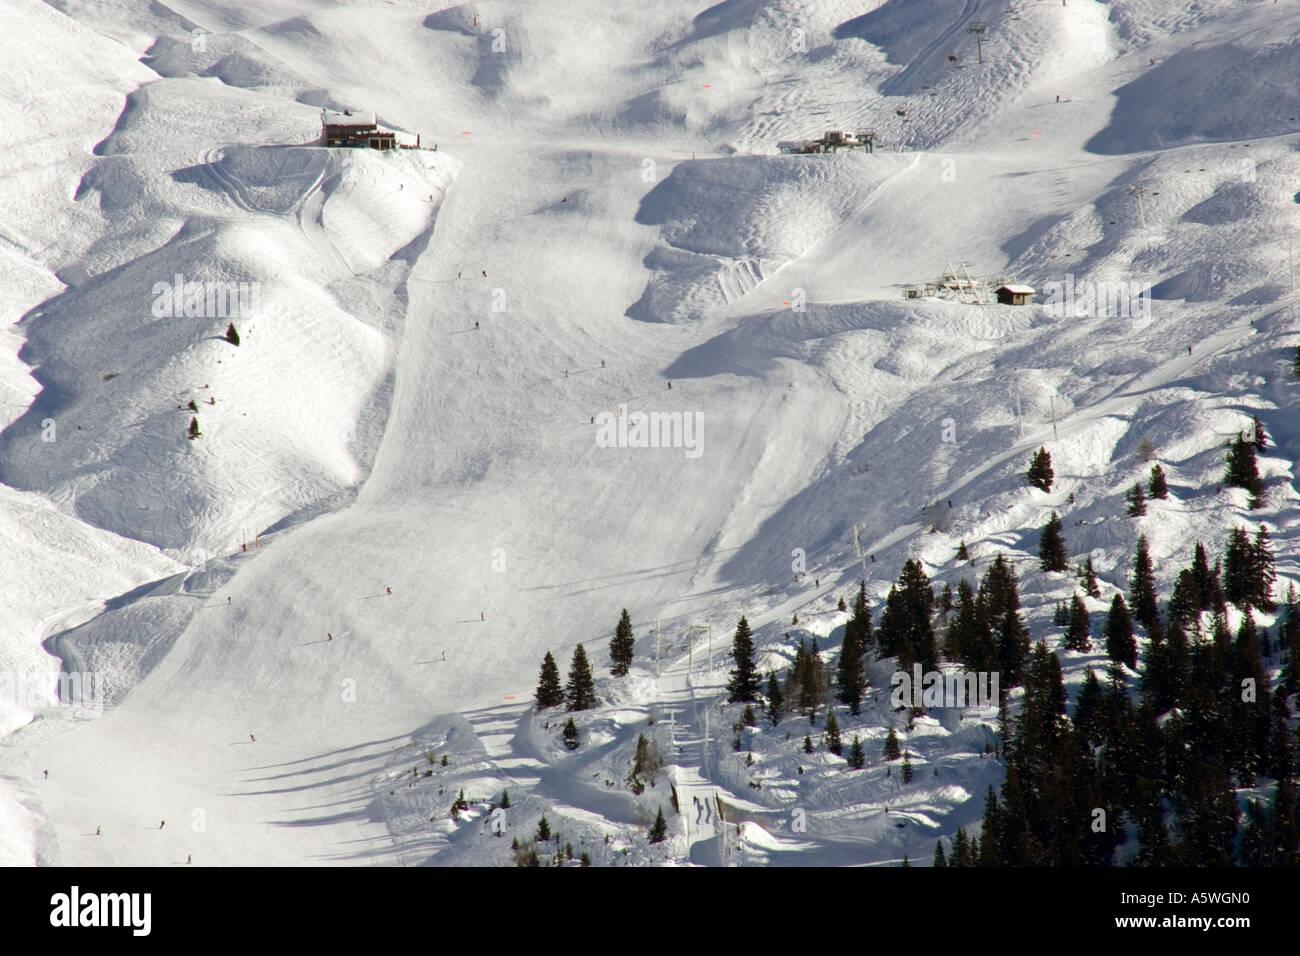 Piste Flaine Ski Resort In Stock Photos & Piste Flaine Ski Resort In ...